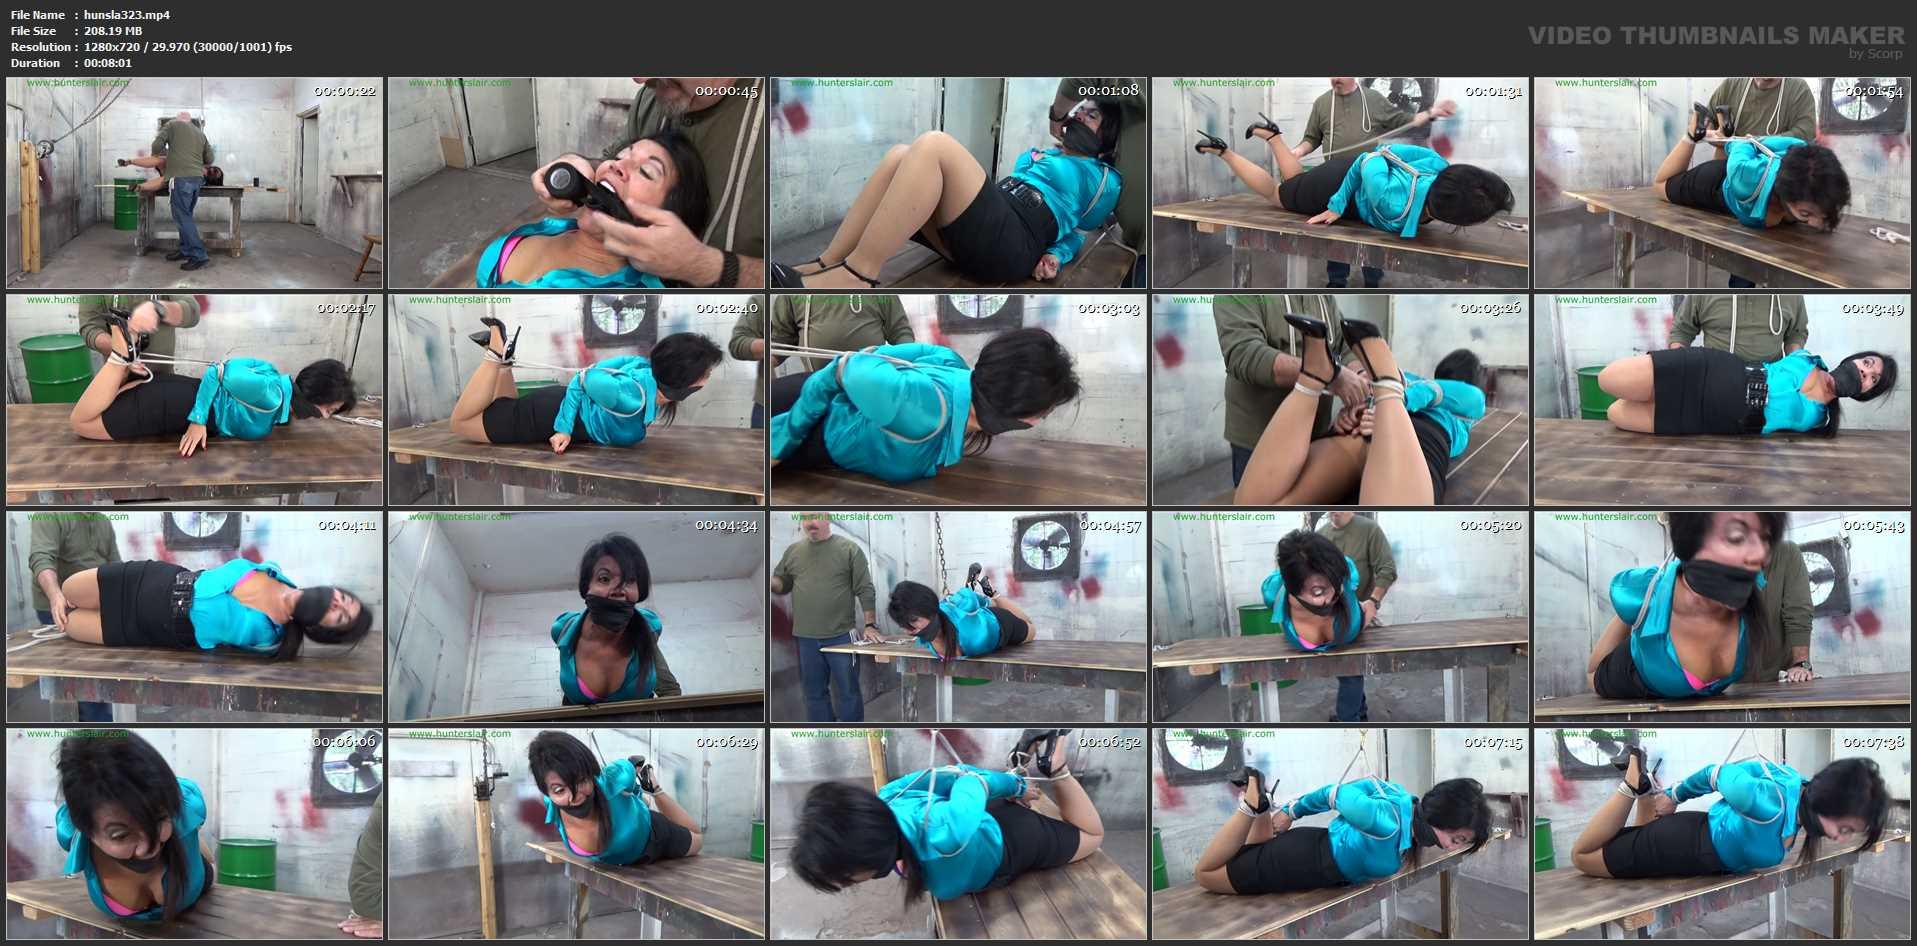 [HUNTERSLAIR] Slammed onto his table and brutally hogtied. Featuring: Gigi [HD][720p][MP4]